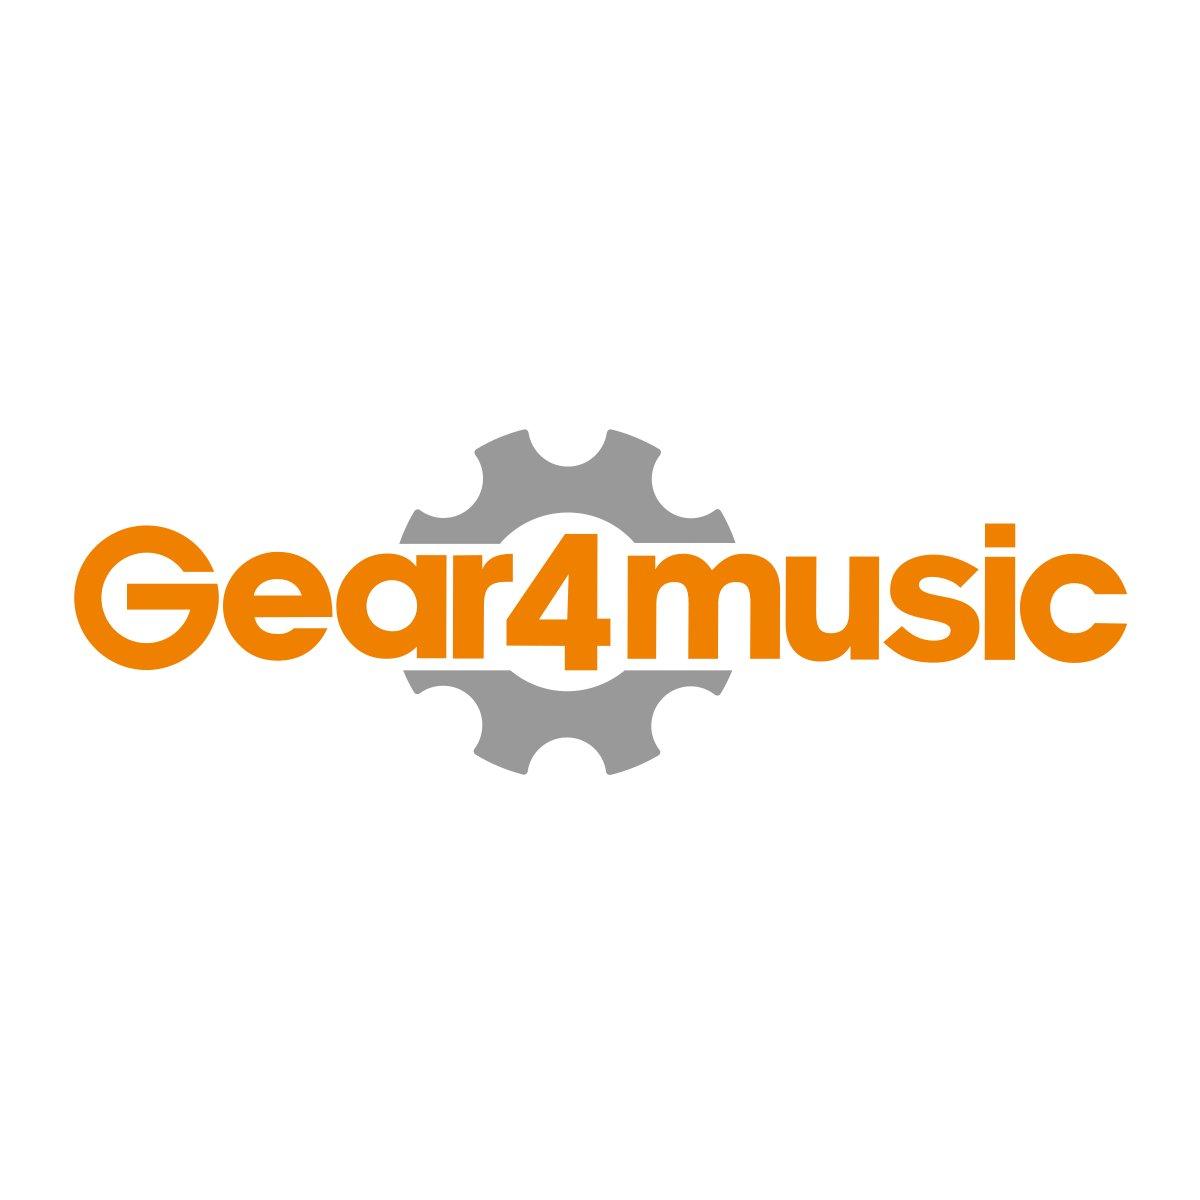 MK-2000 54-key Portable Keyboard by Gear4music - Nearly New